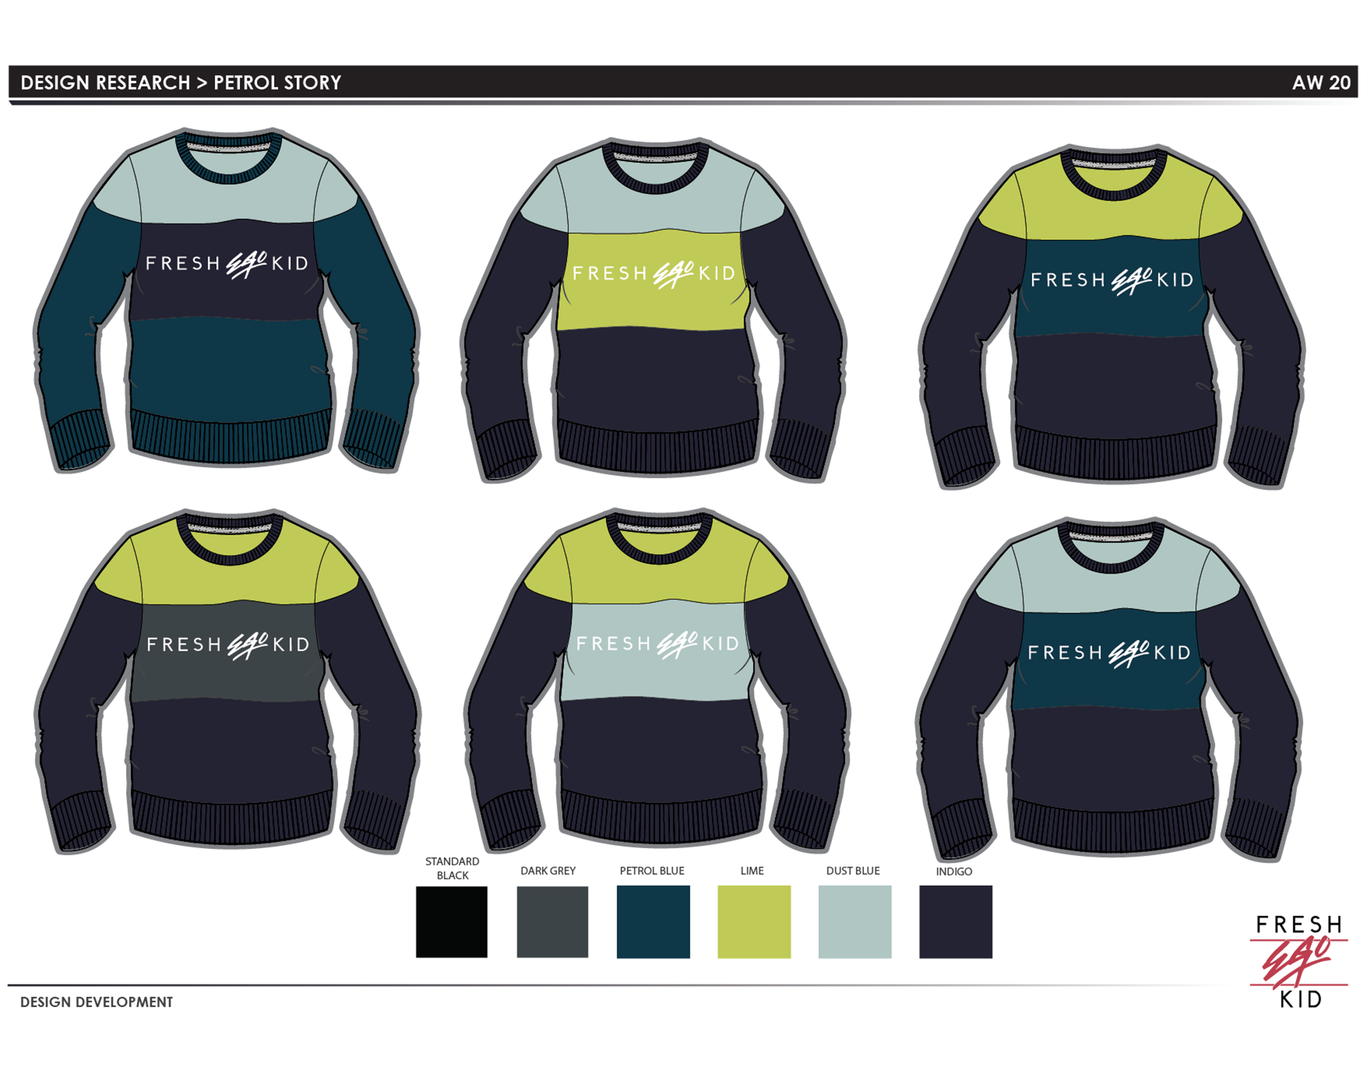 FEK - Crew sweater design 2